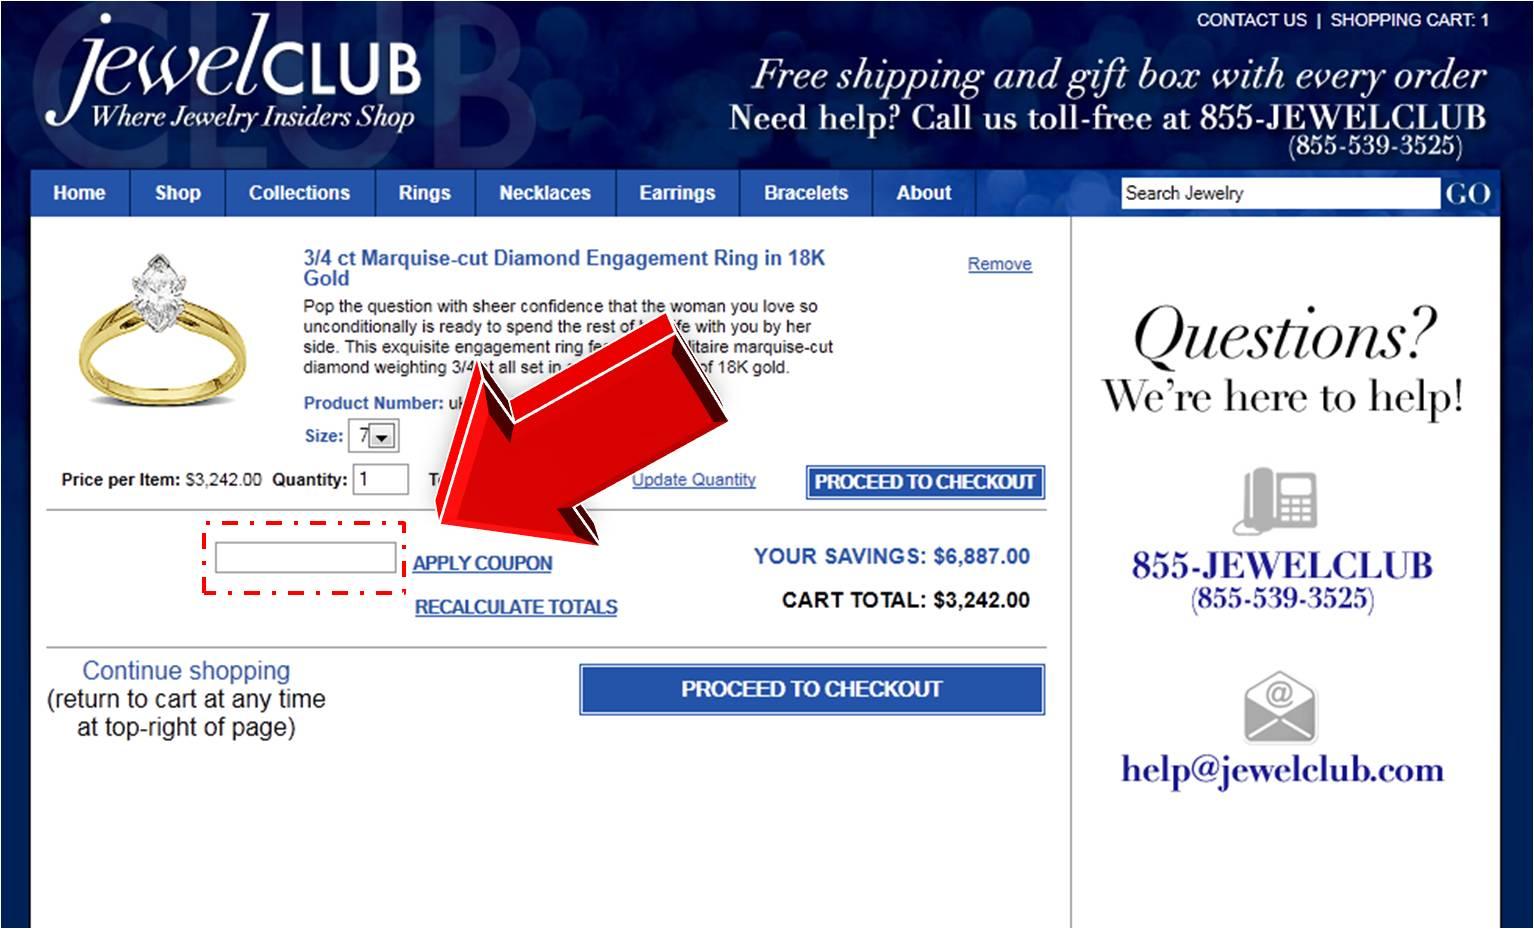 jewelclub promo code coupon code